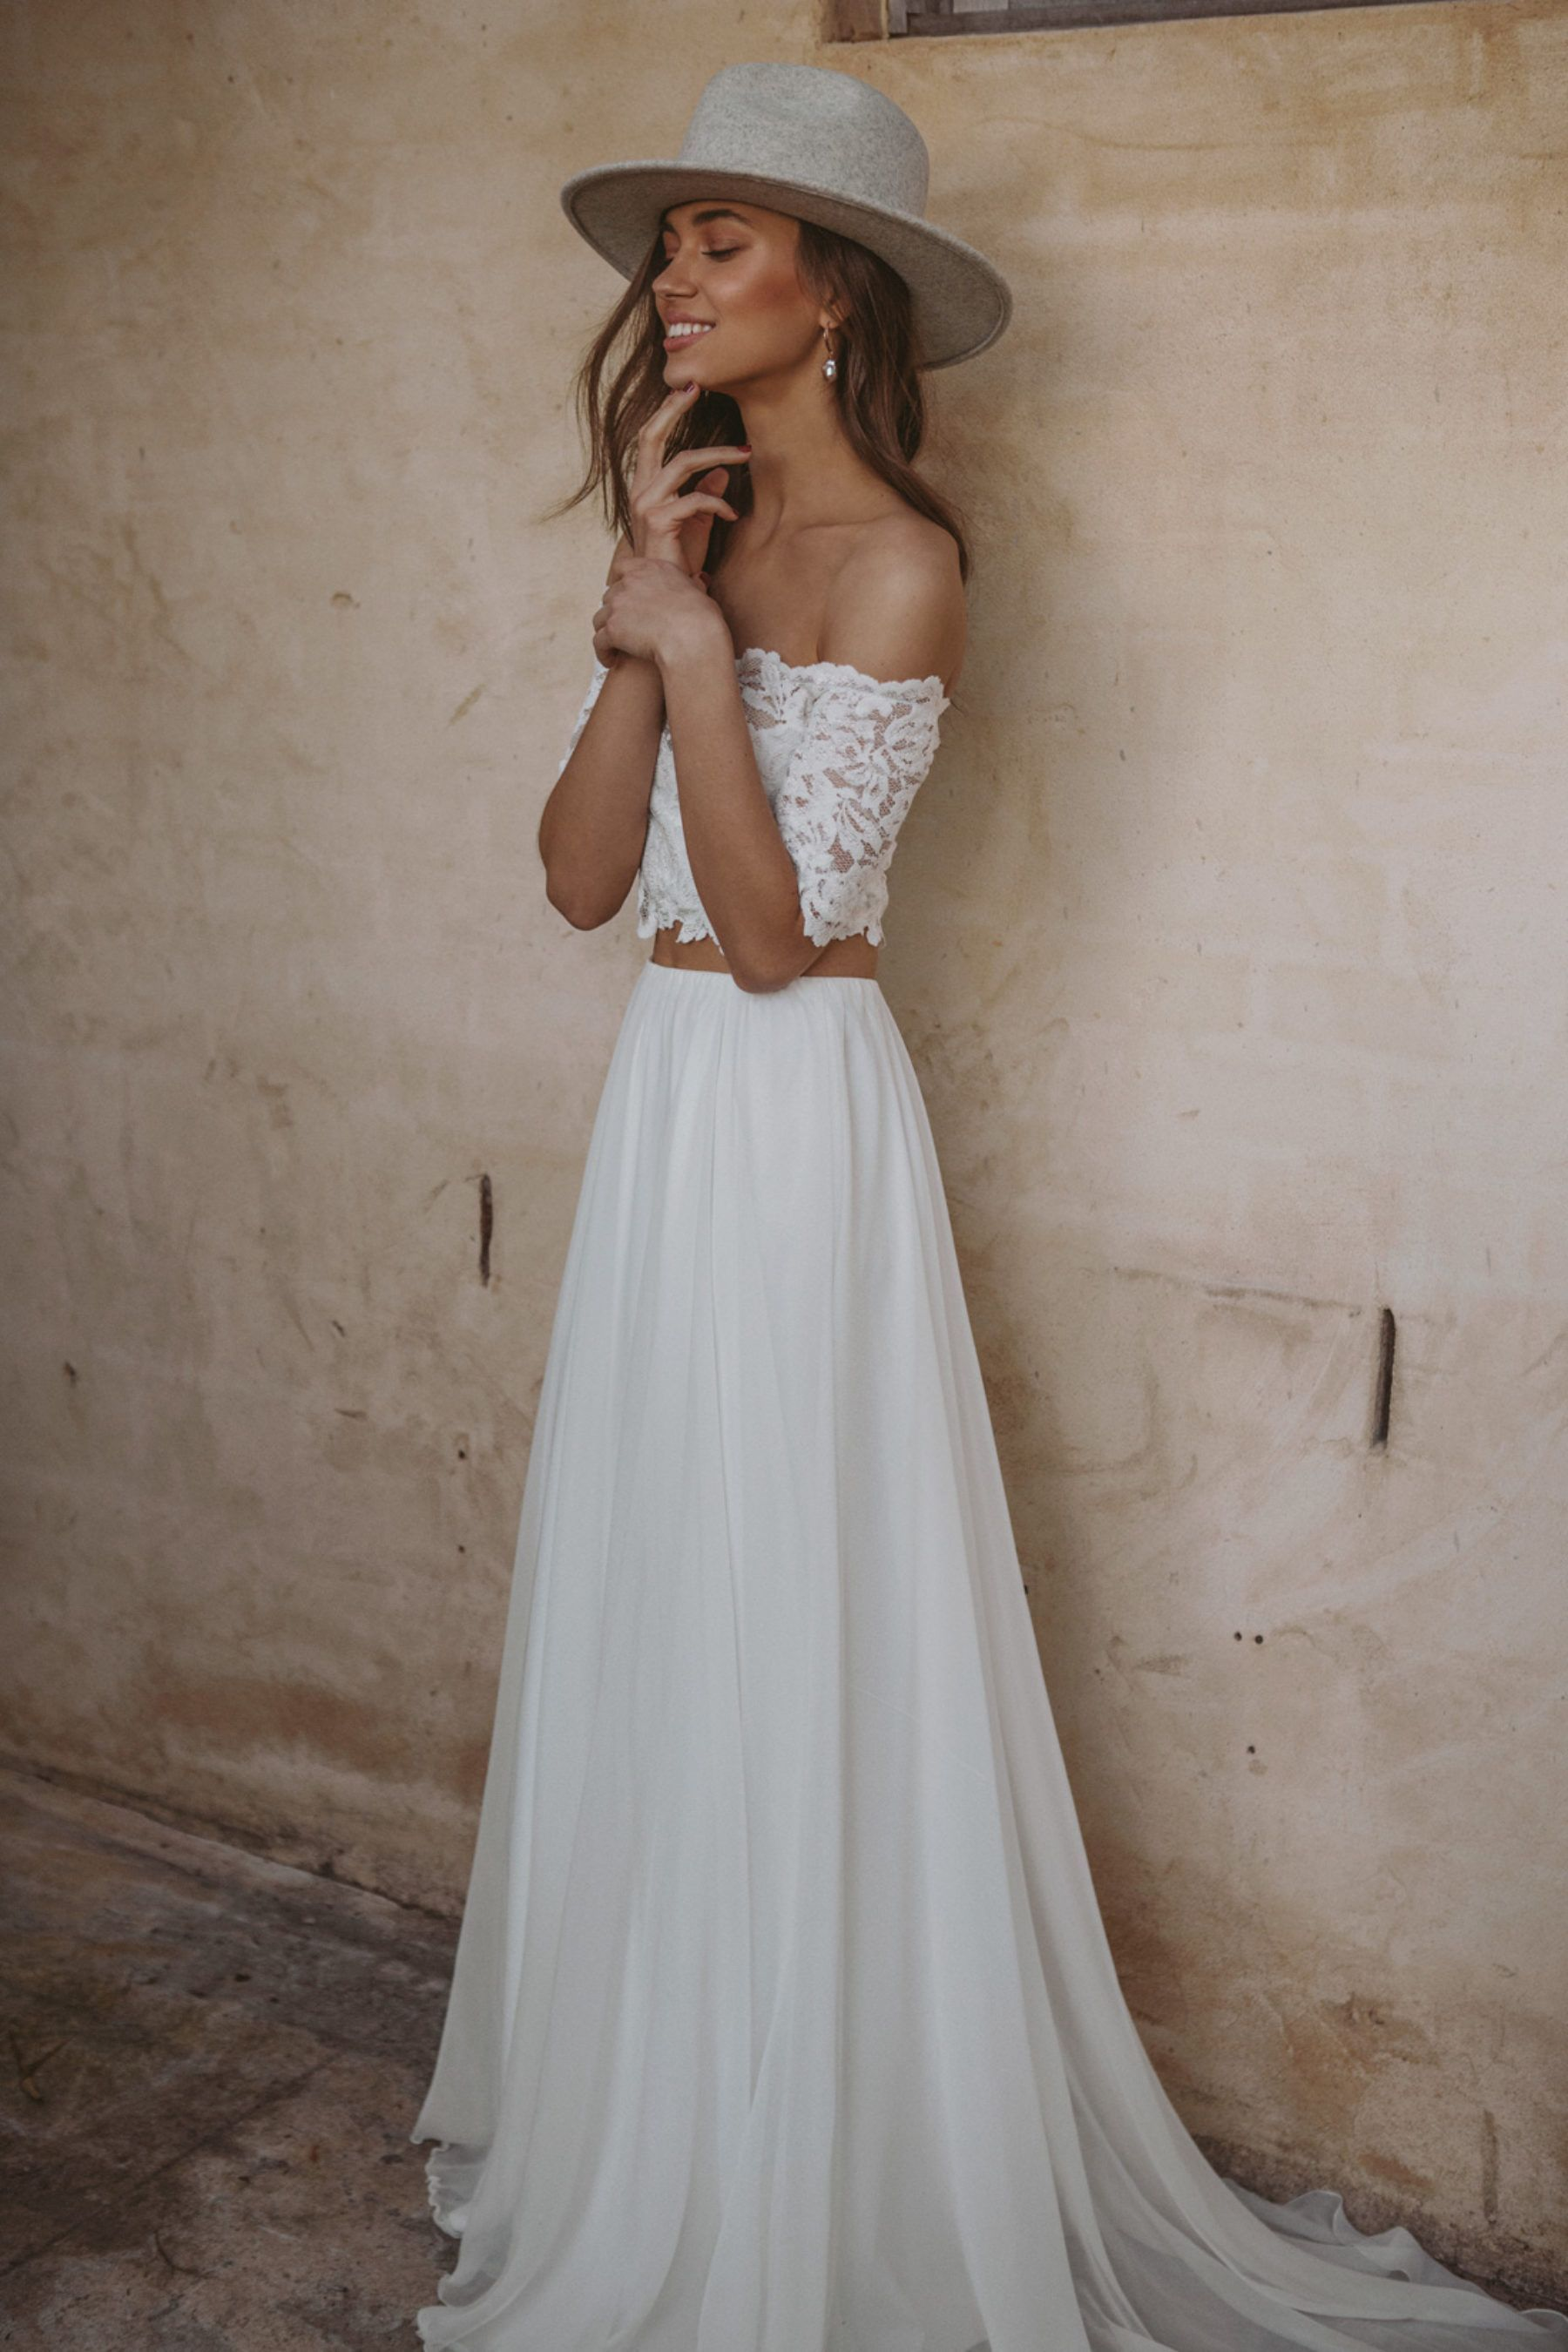 Les deuxud by grace loves lace Кружева pinterest boda vestidos